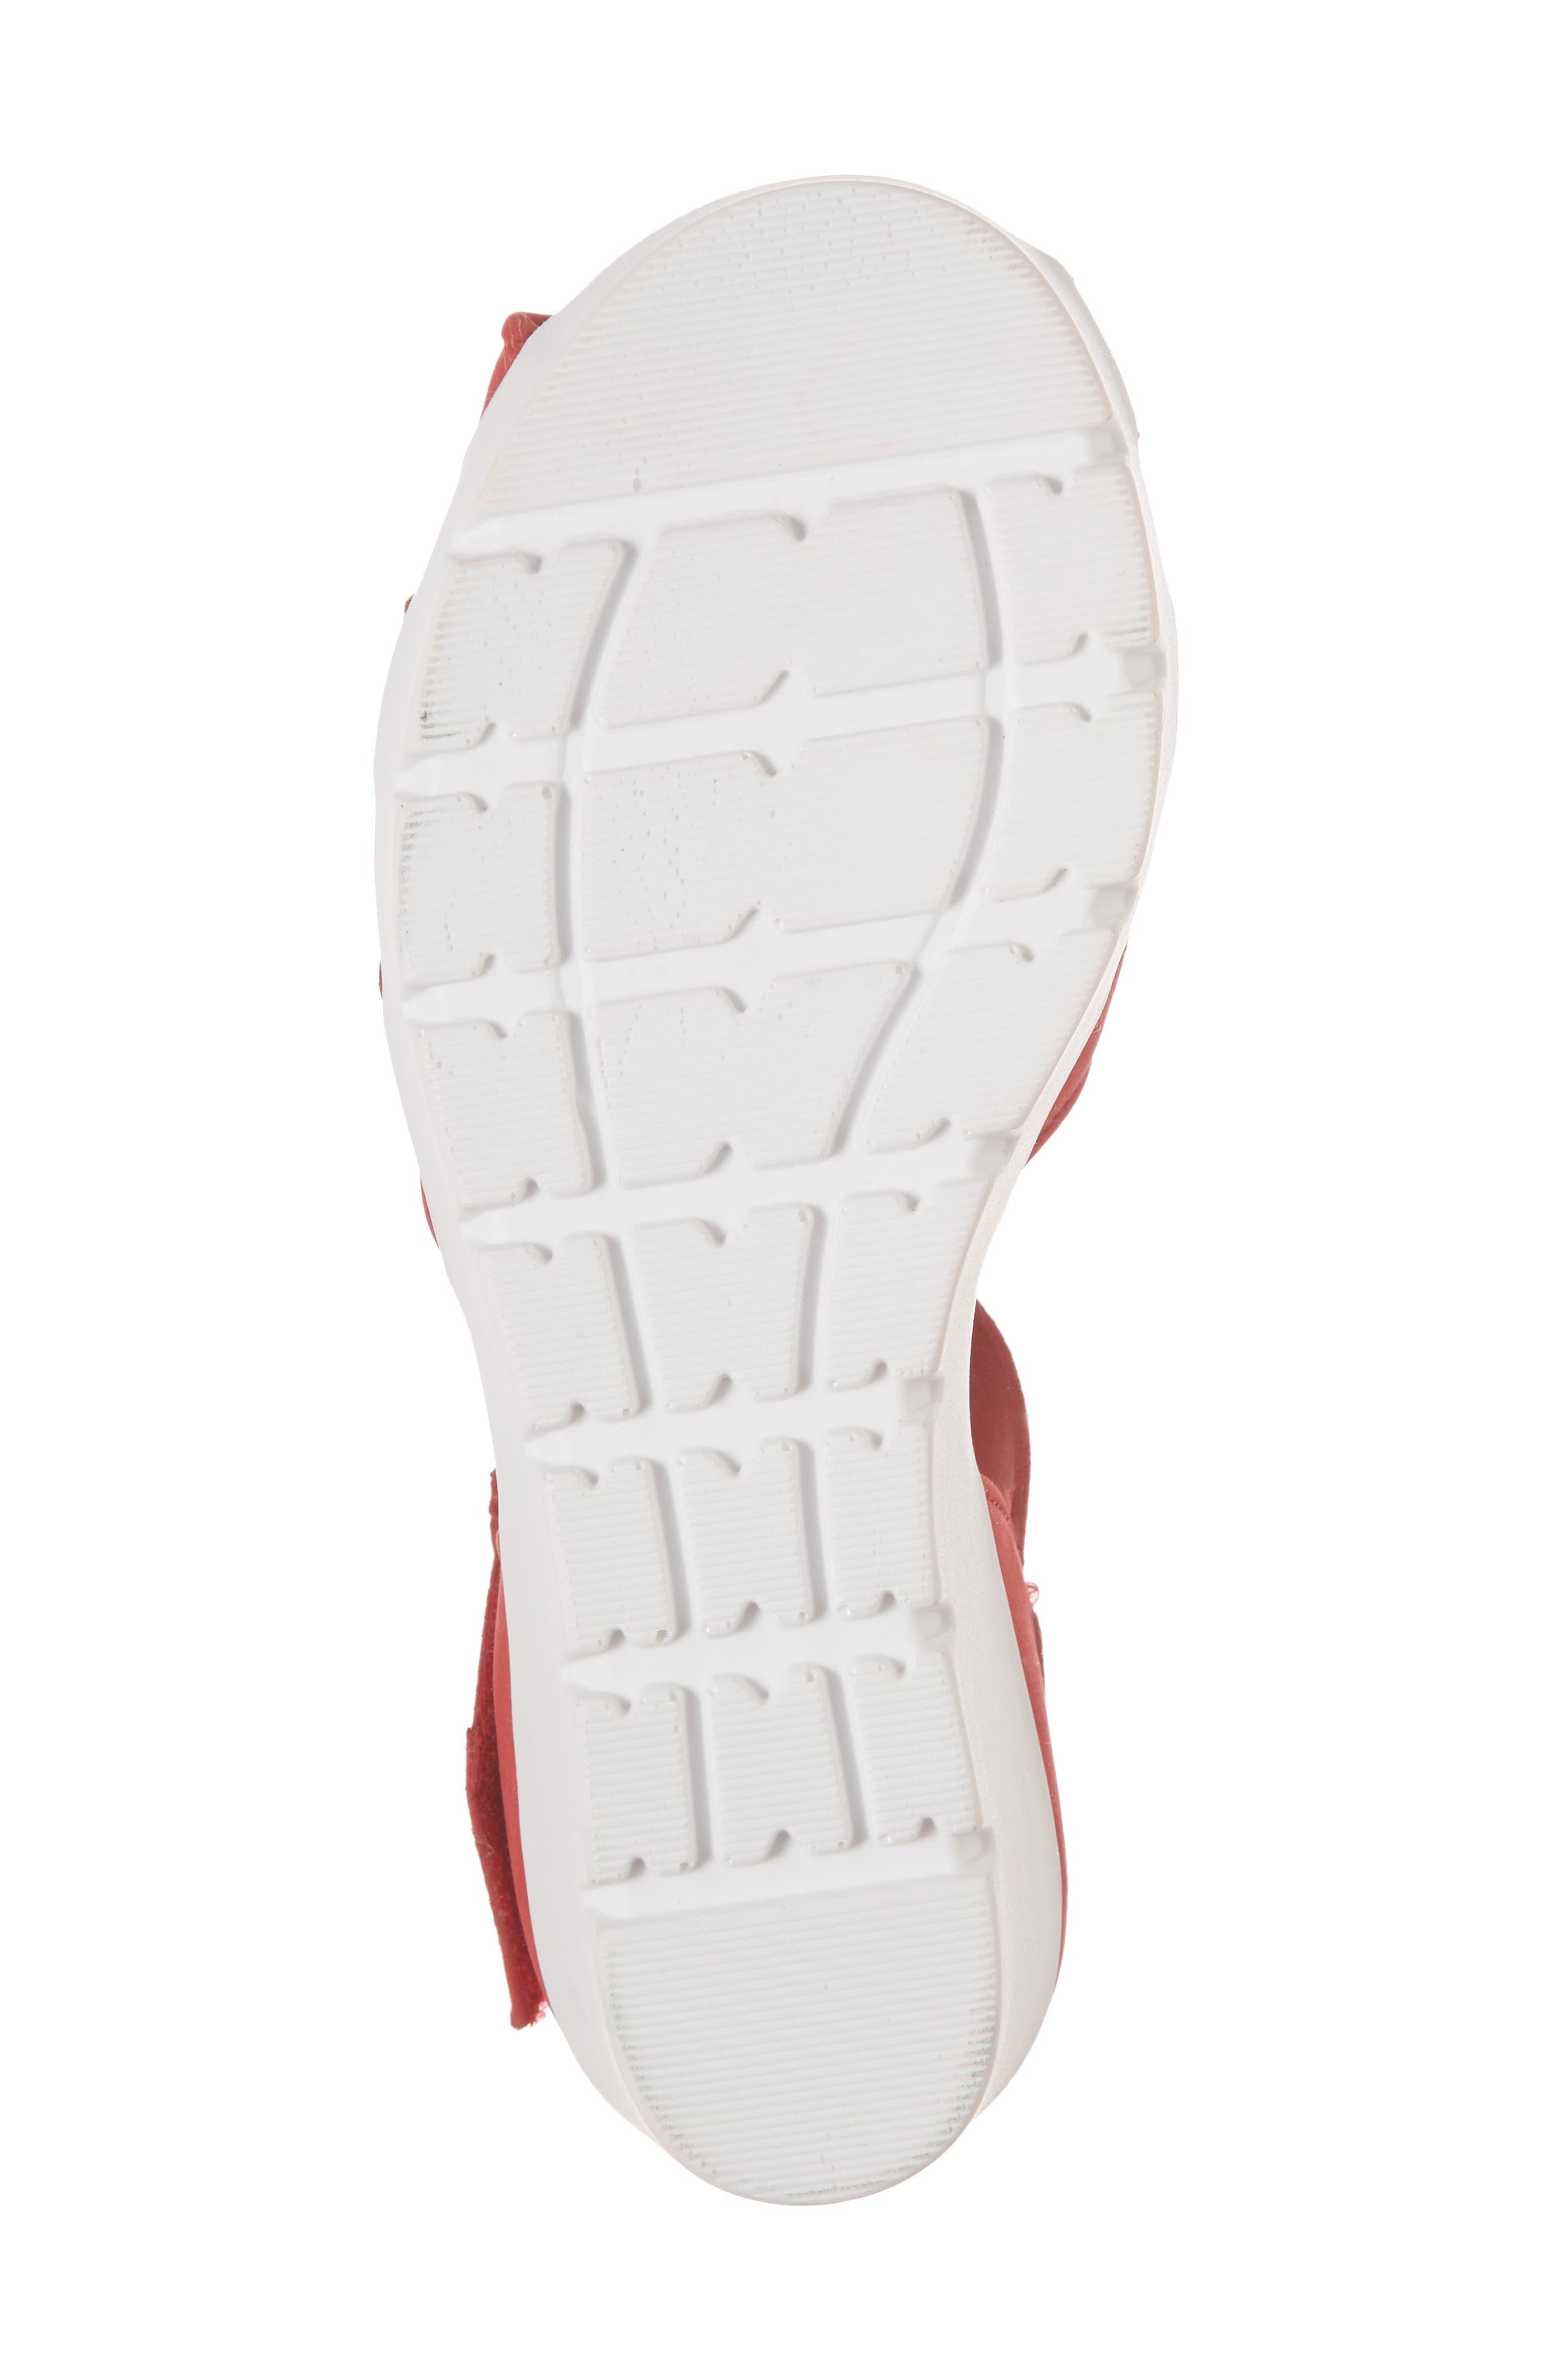 Sharon Platform Wedge Sandal,                             Alternate thumbnail 6, color,                             Red Nubuck Leather